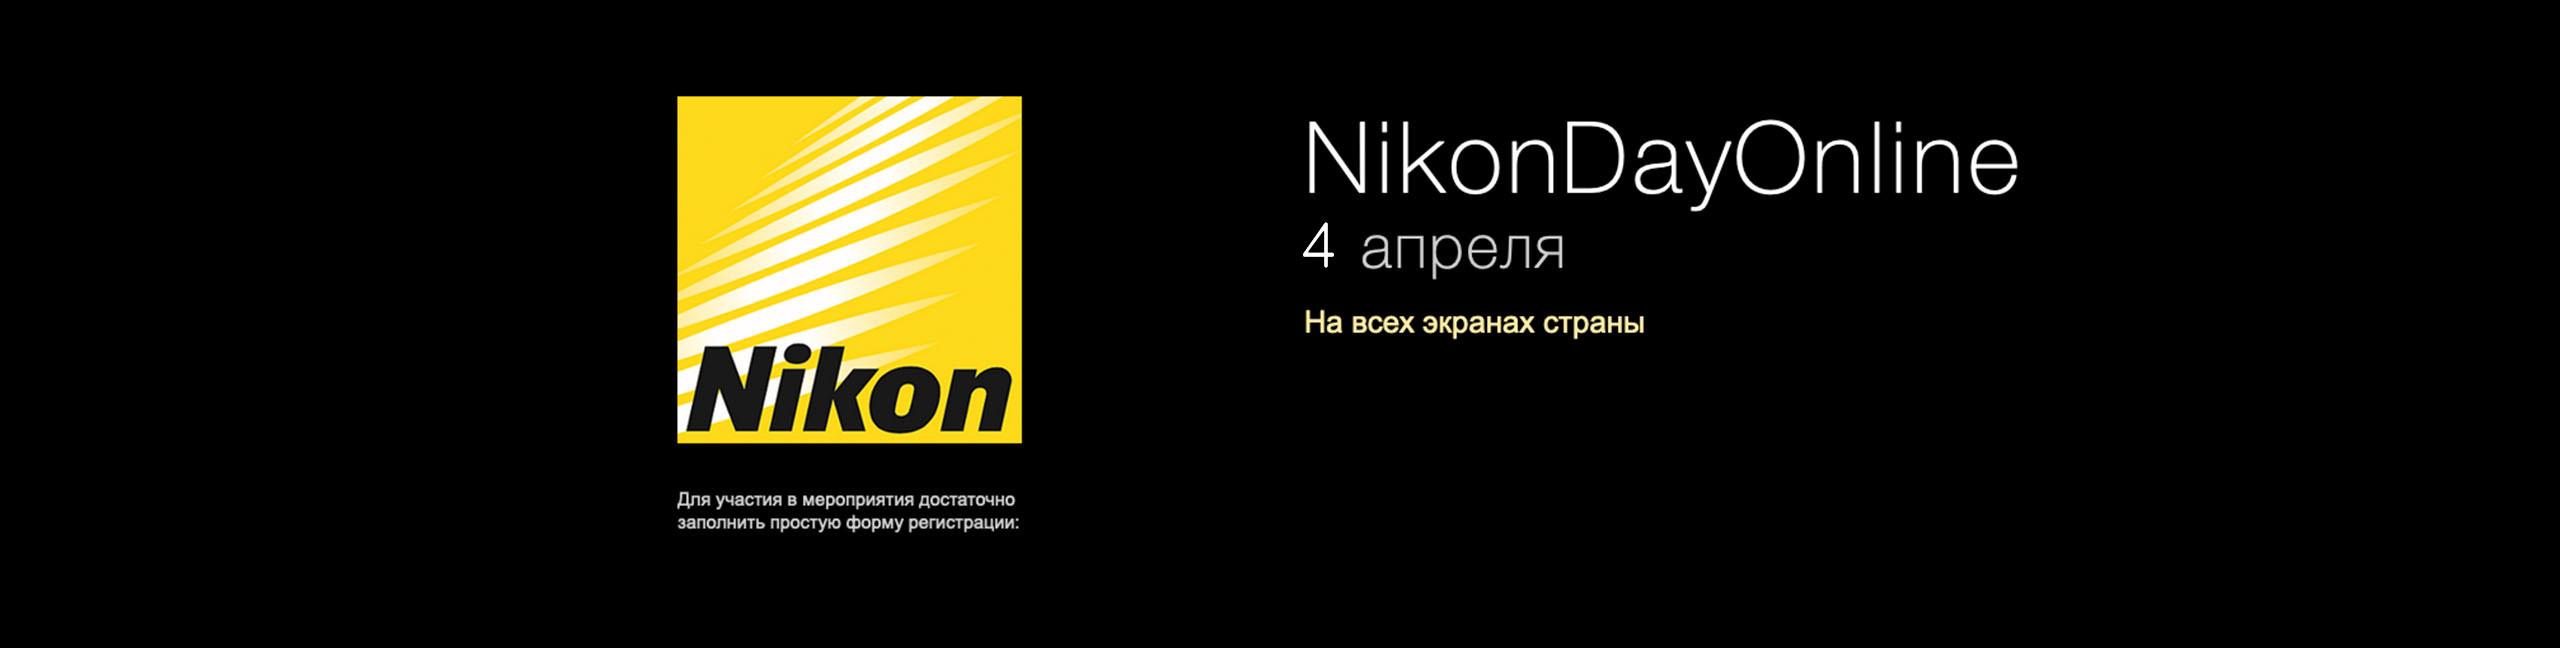 Nikon Day 2020 — впервые онлайн